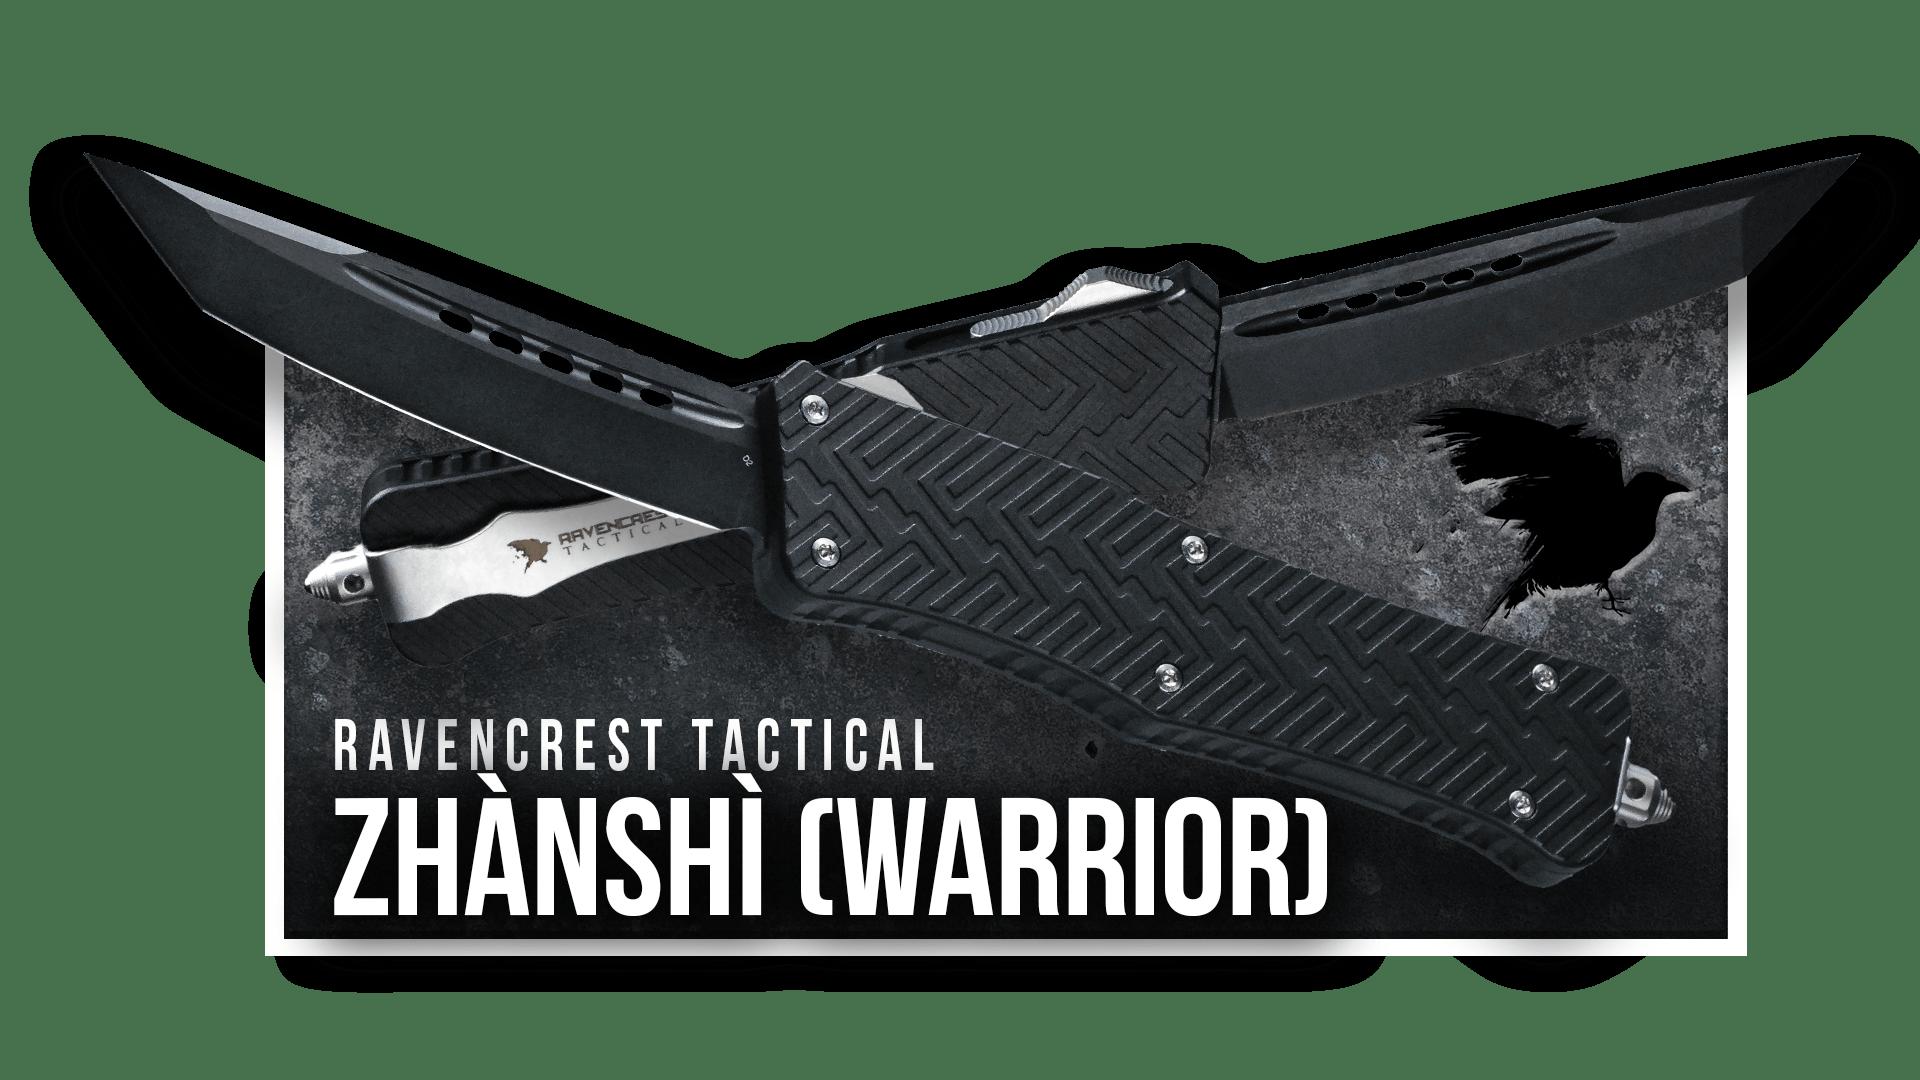 OTF Knife - Zhanshi - RavenCrest Tactical